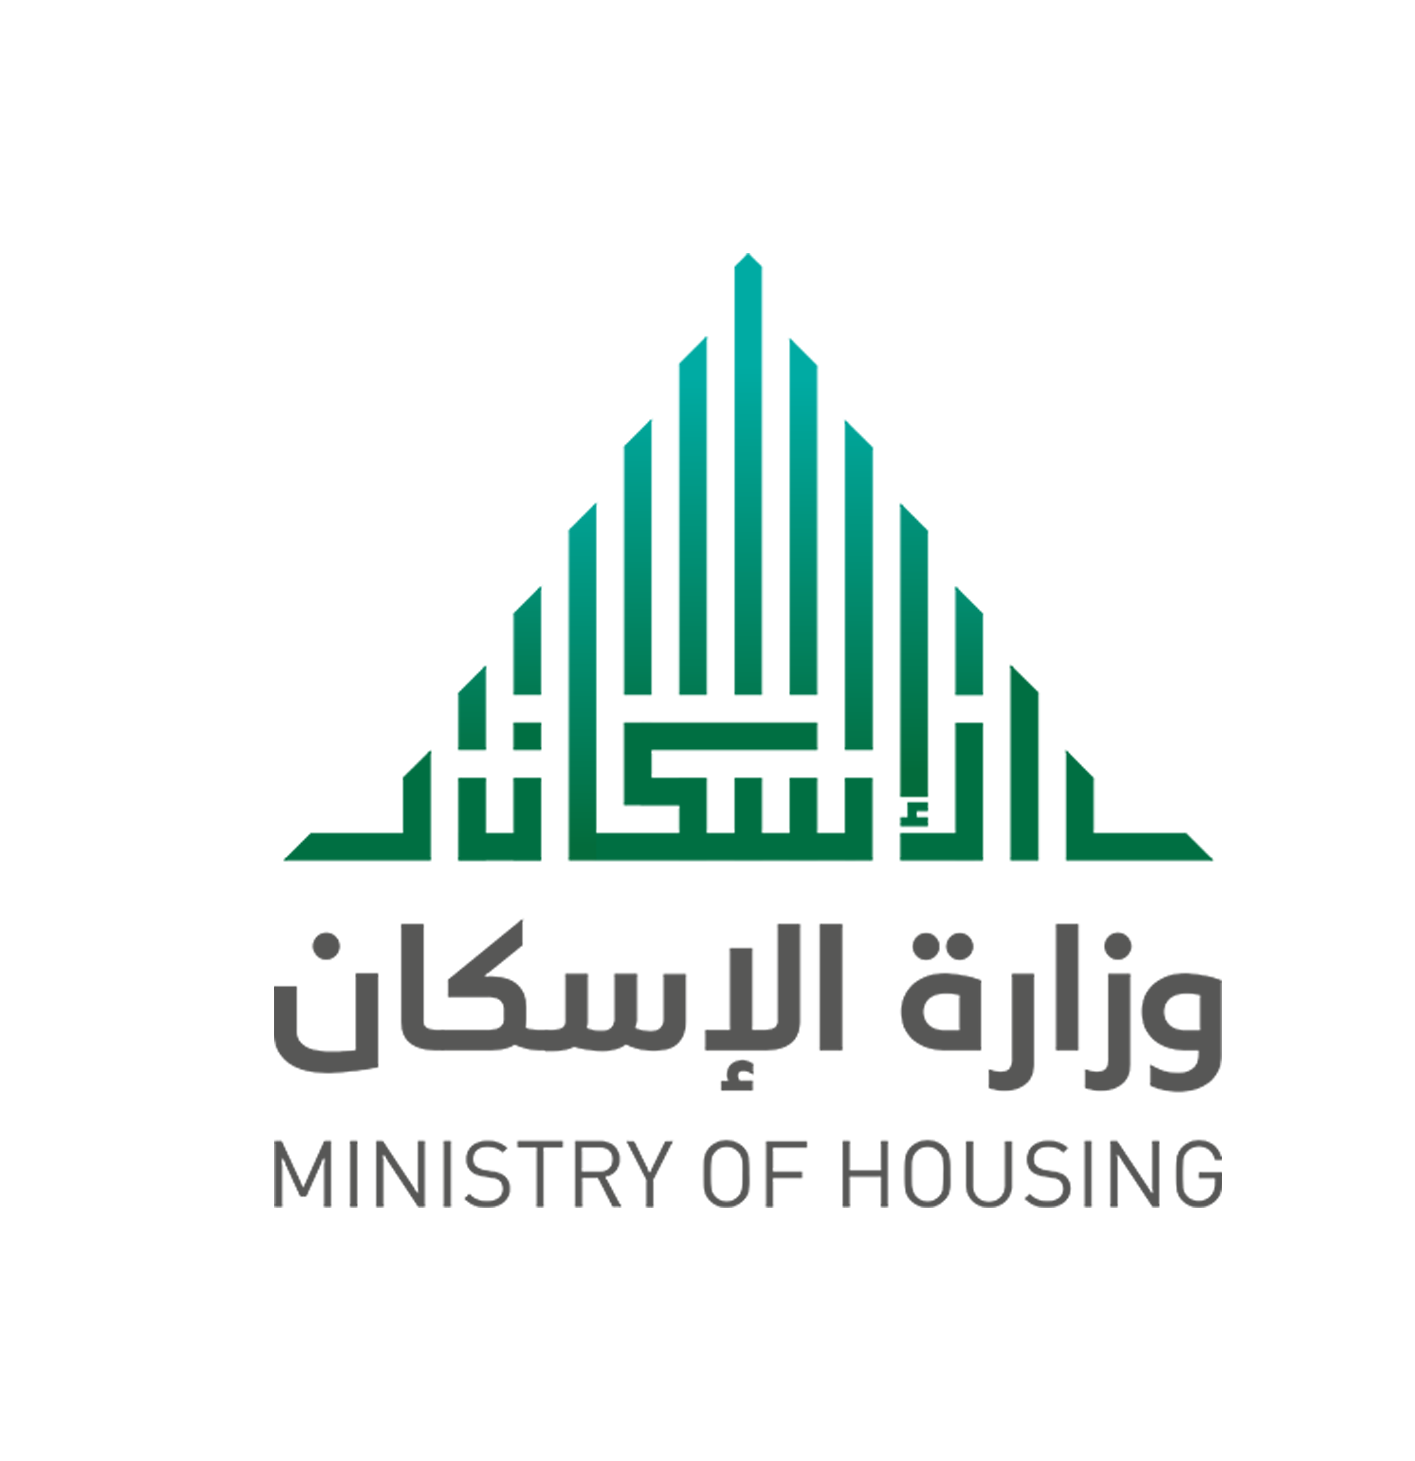 minsteryofhousing web.png